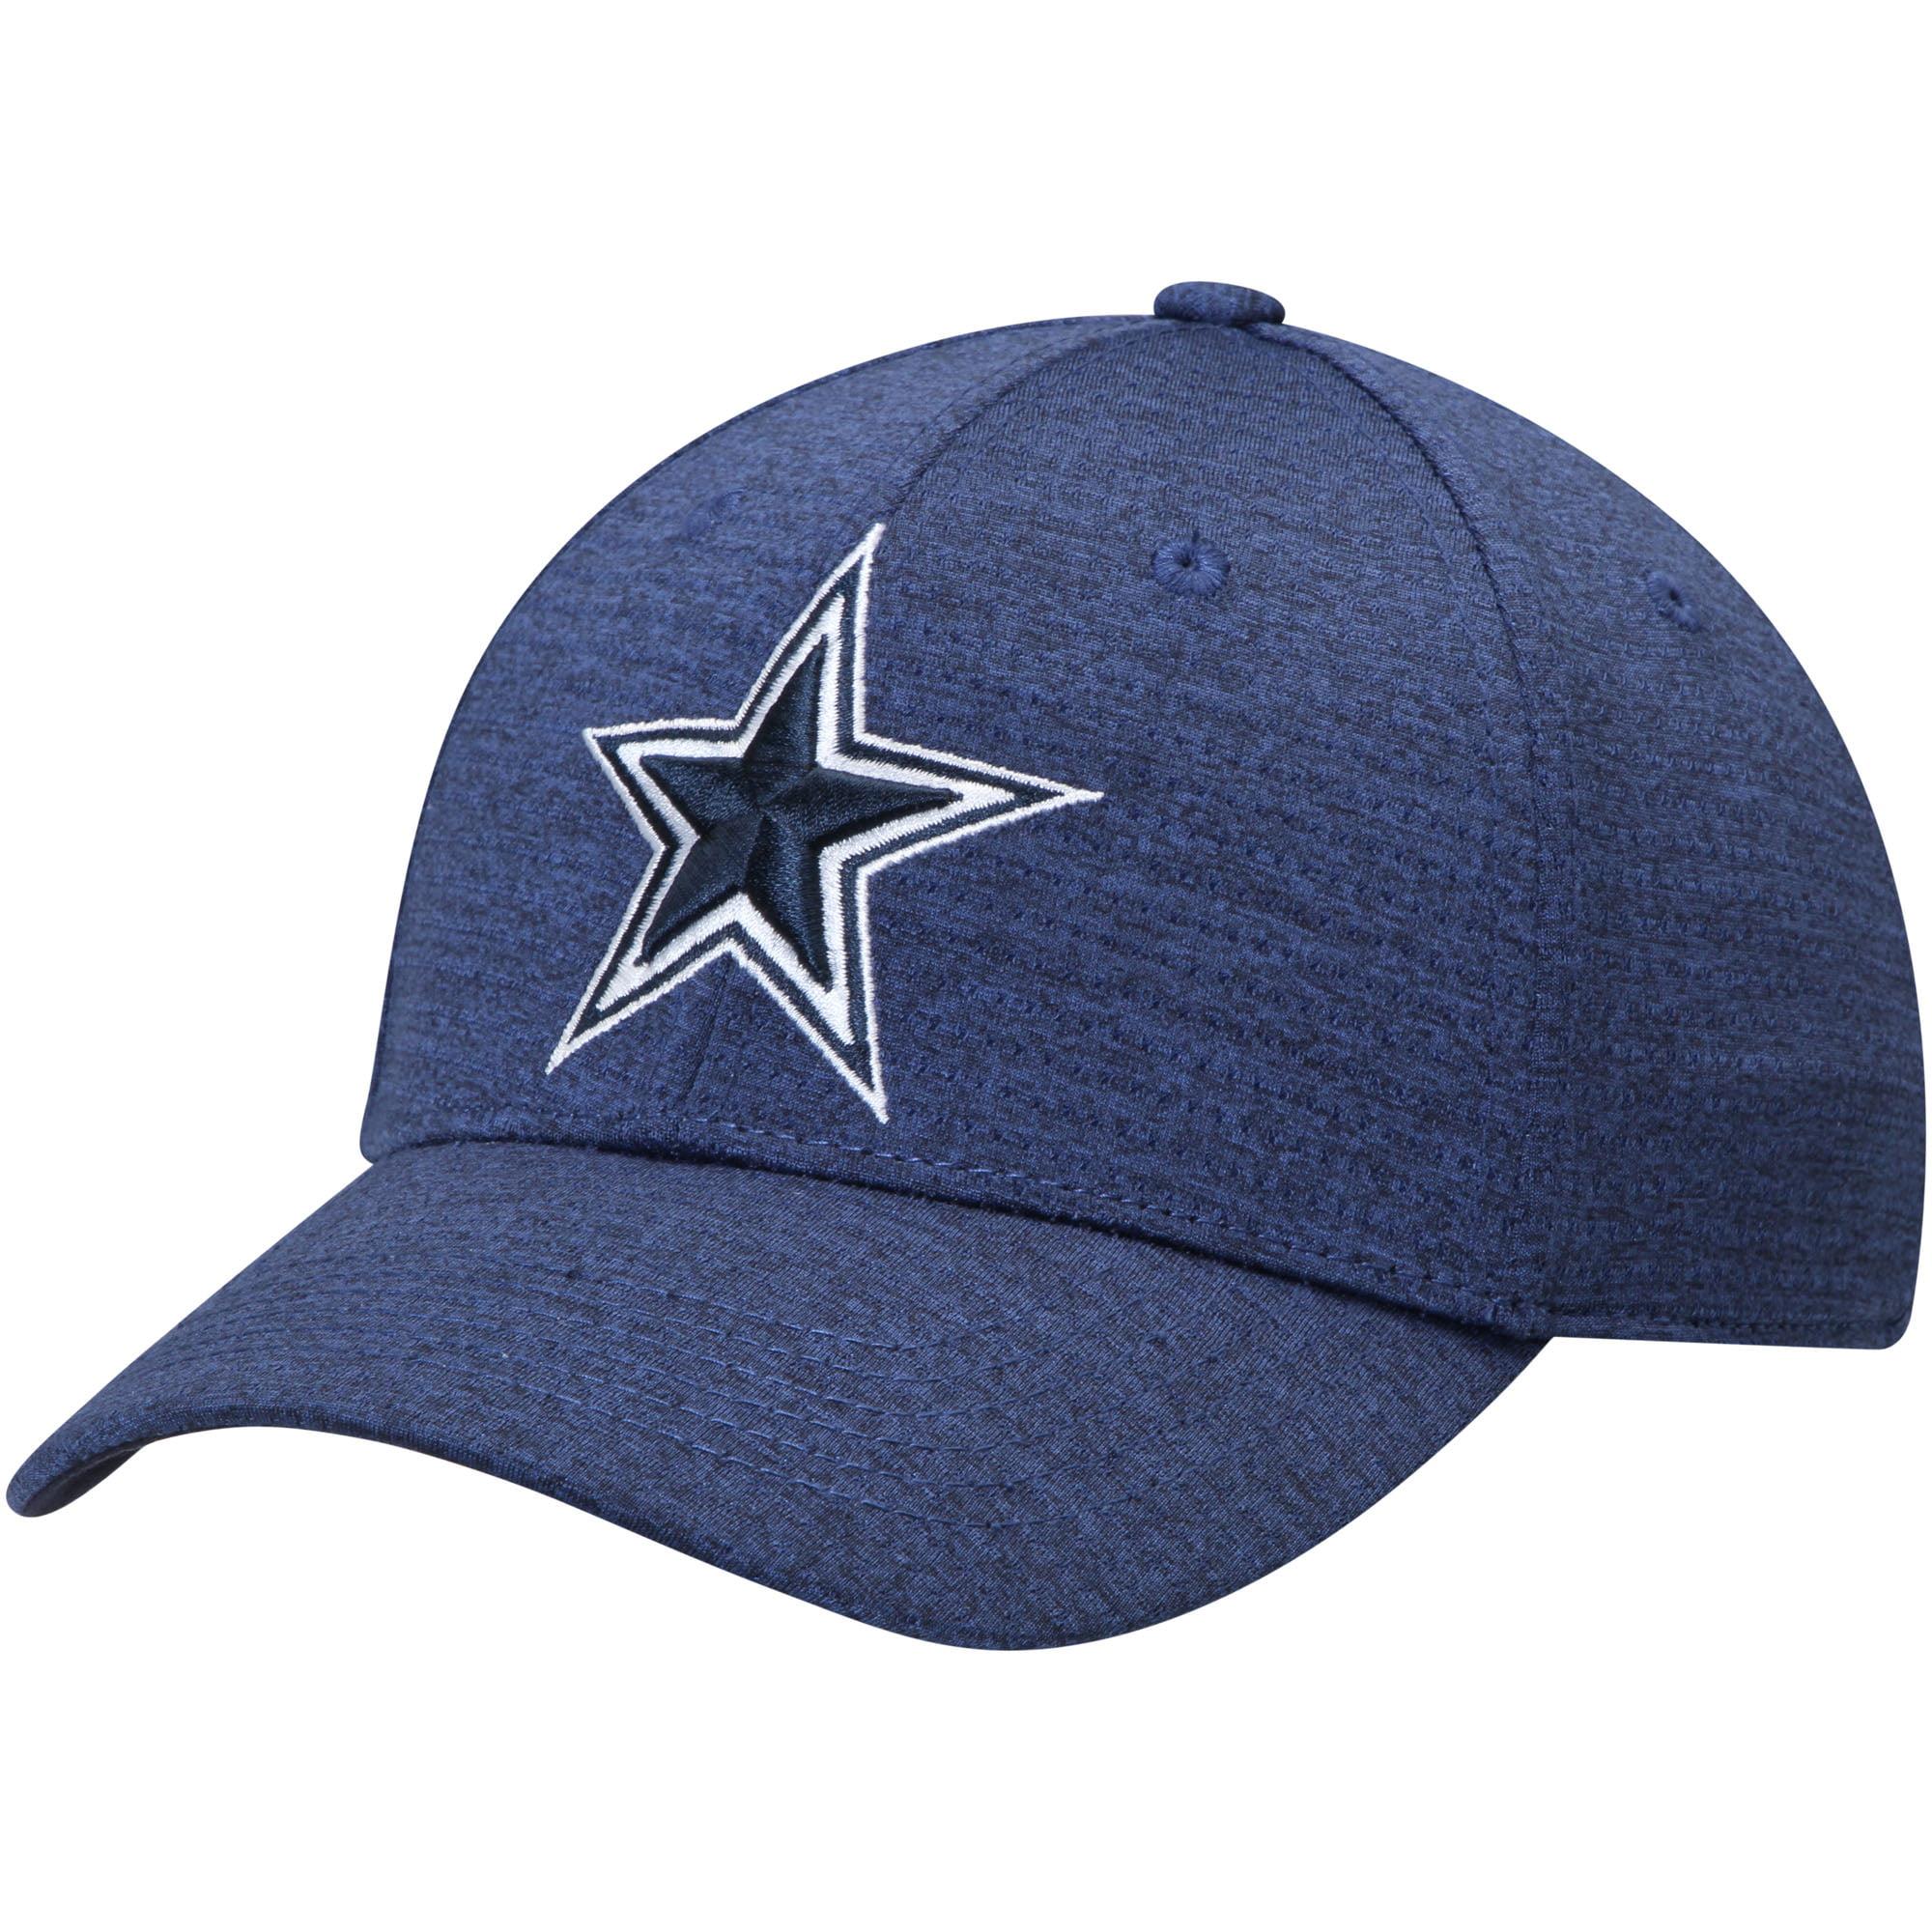 Men's Heathered Navy Dallas Cowboys Woodley Flex Hat